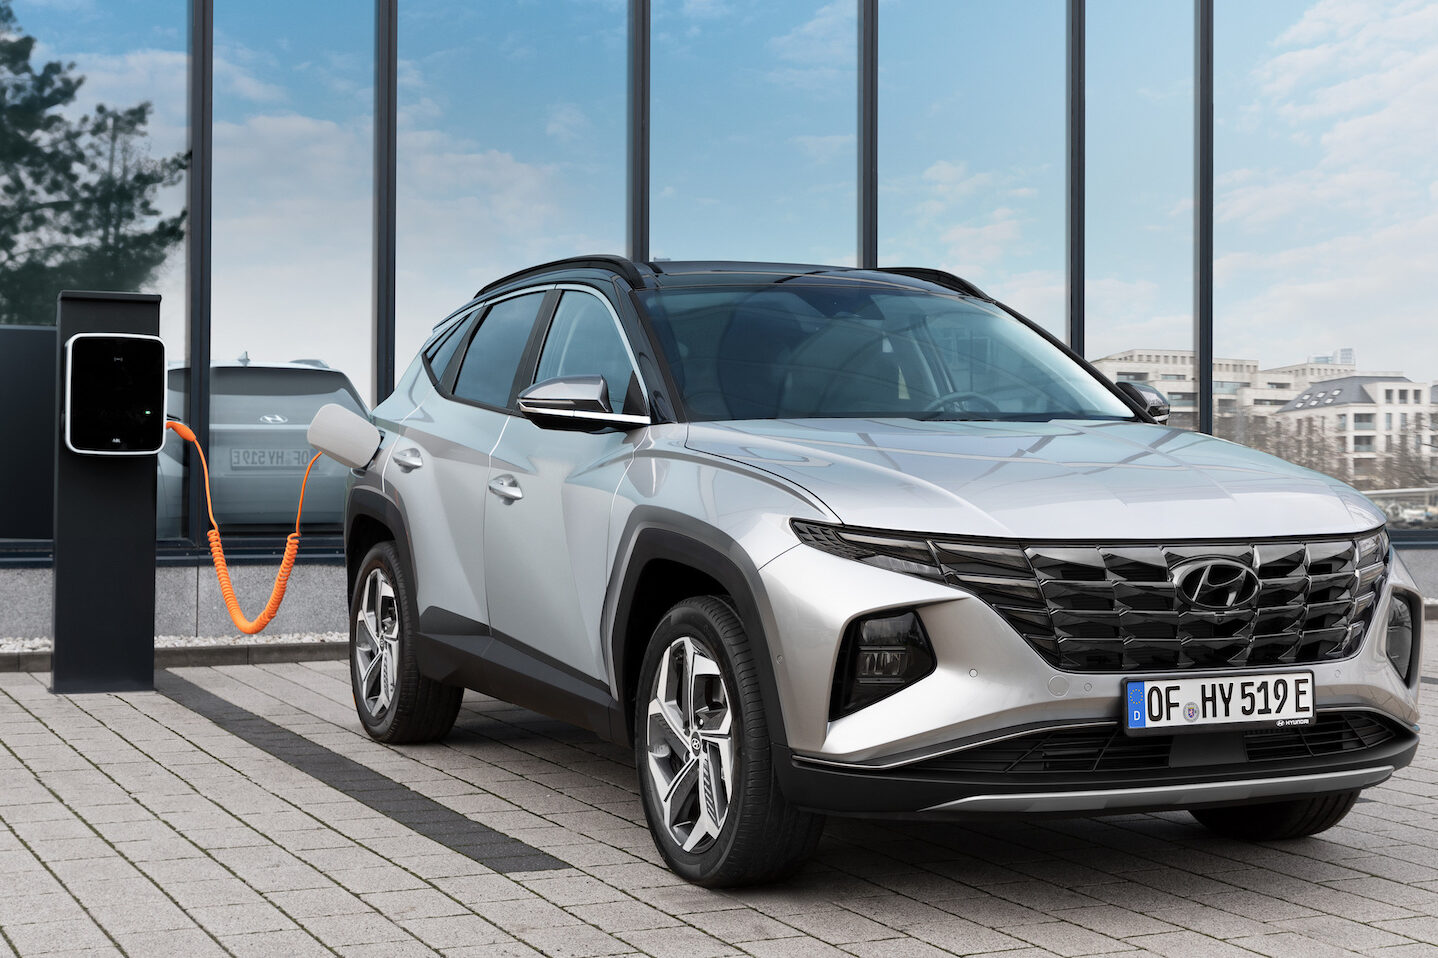 Hyundai Tucson plug-in hybrid charging - EVs Unplugged